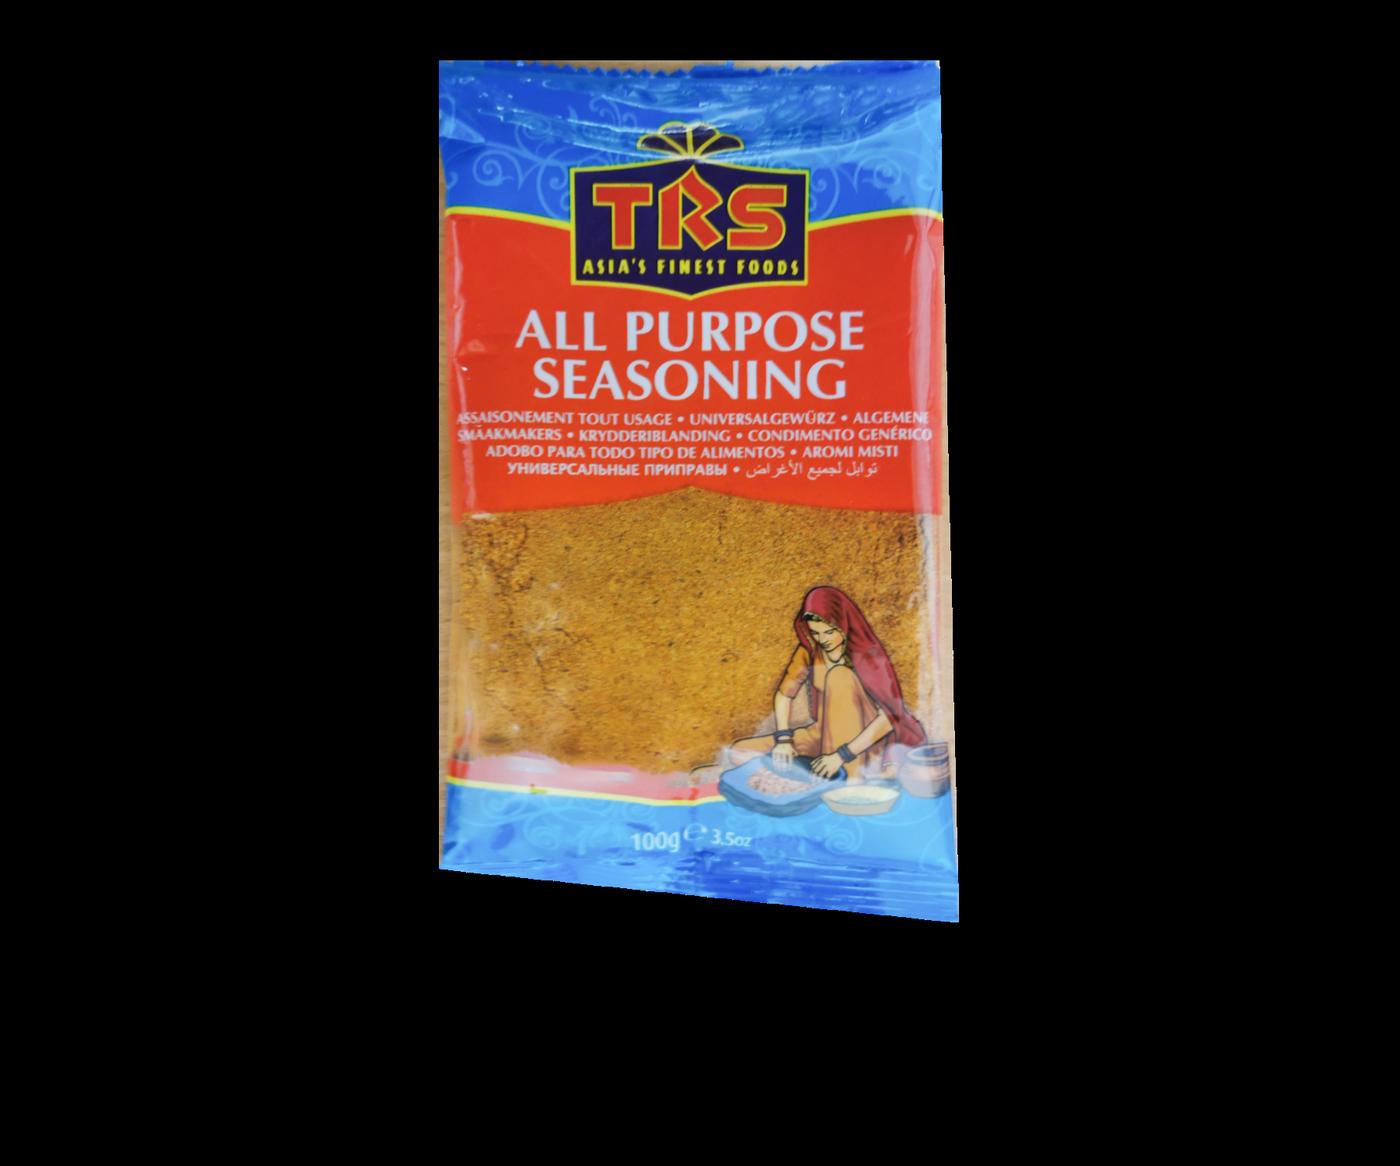 TRS All Purpose Seasoning